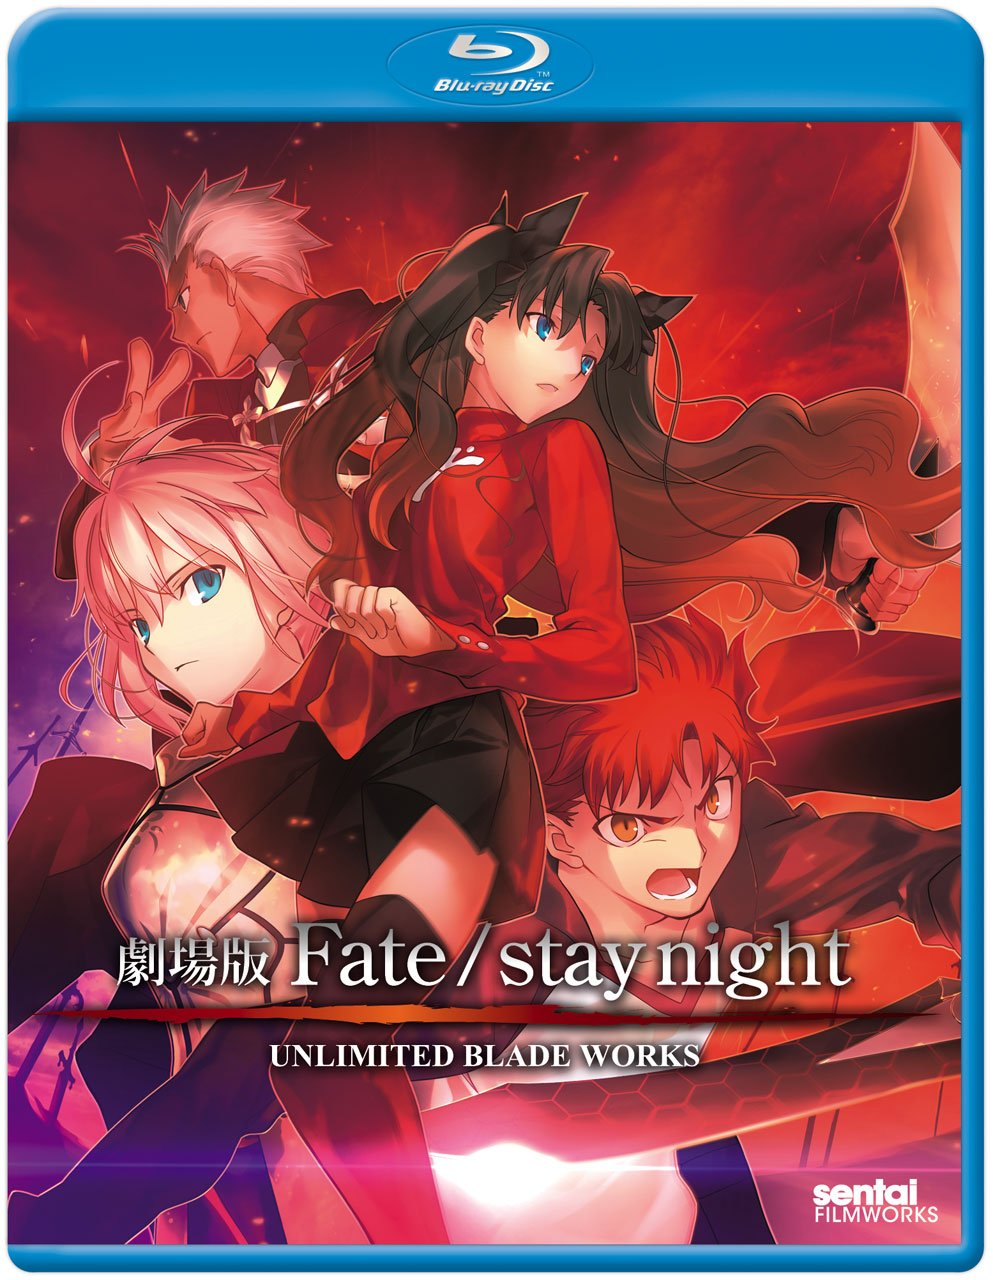 [philosophy-raws][命运长夜:无限剑制][Fate/Stay Night:Unlimited Blade Works][MOVIE+SP][1080p 10bit][国粤日英配音][中英字幕]